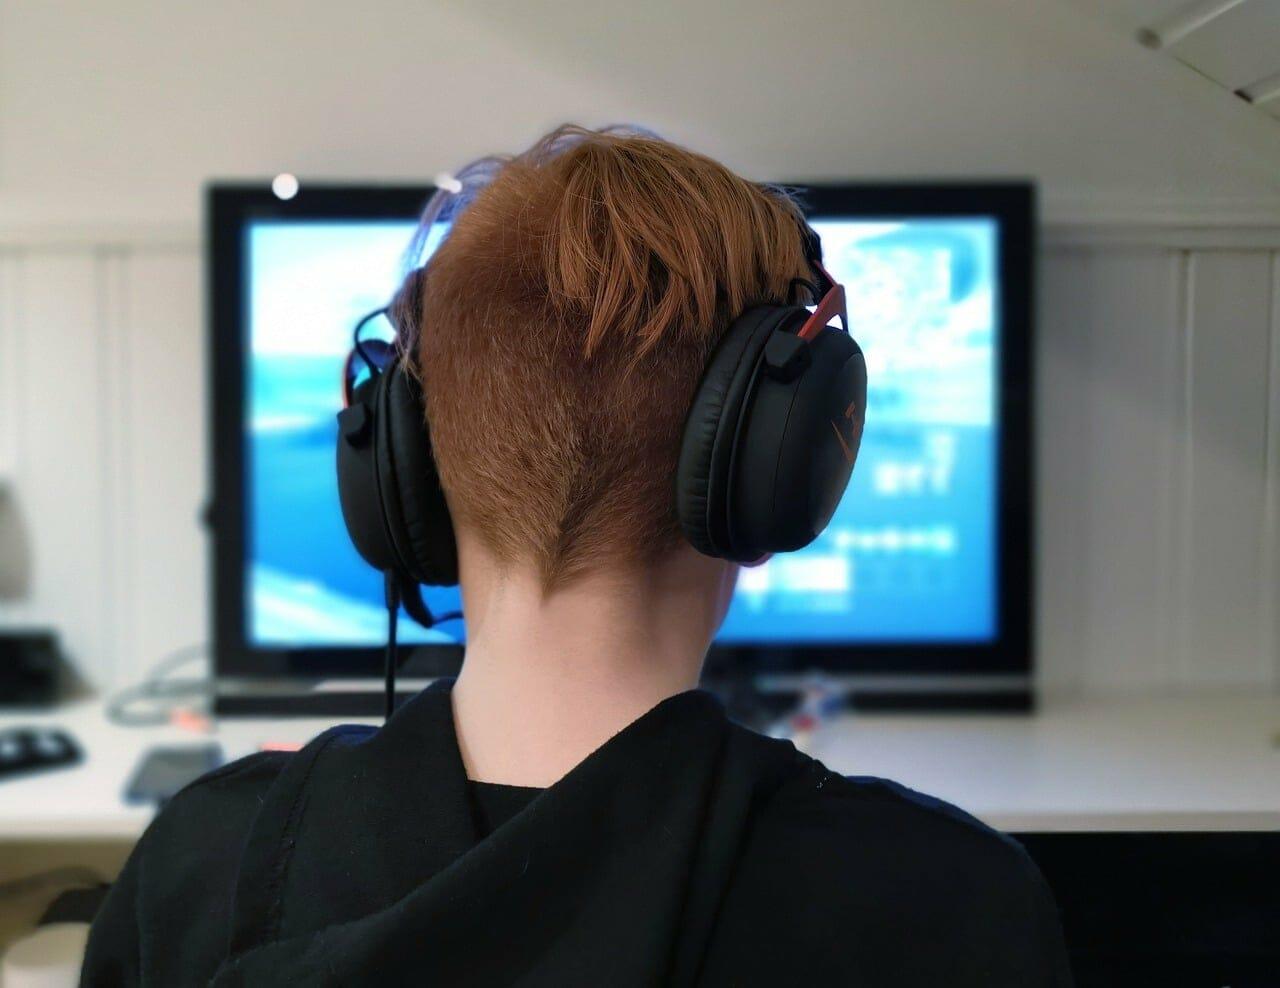 a gamer playing